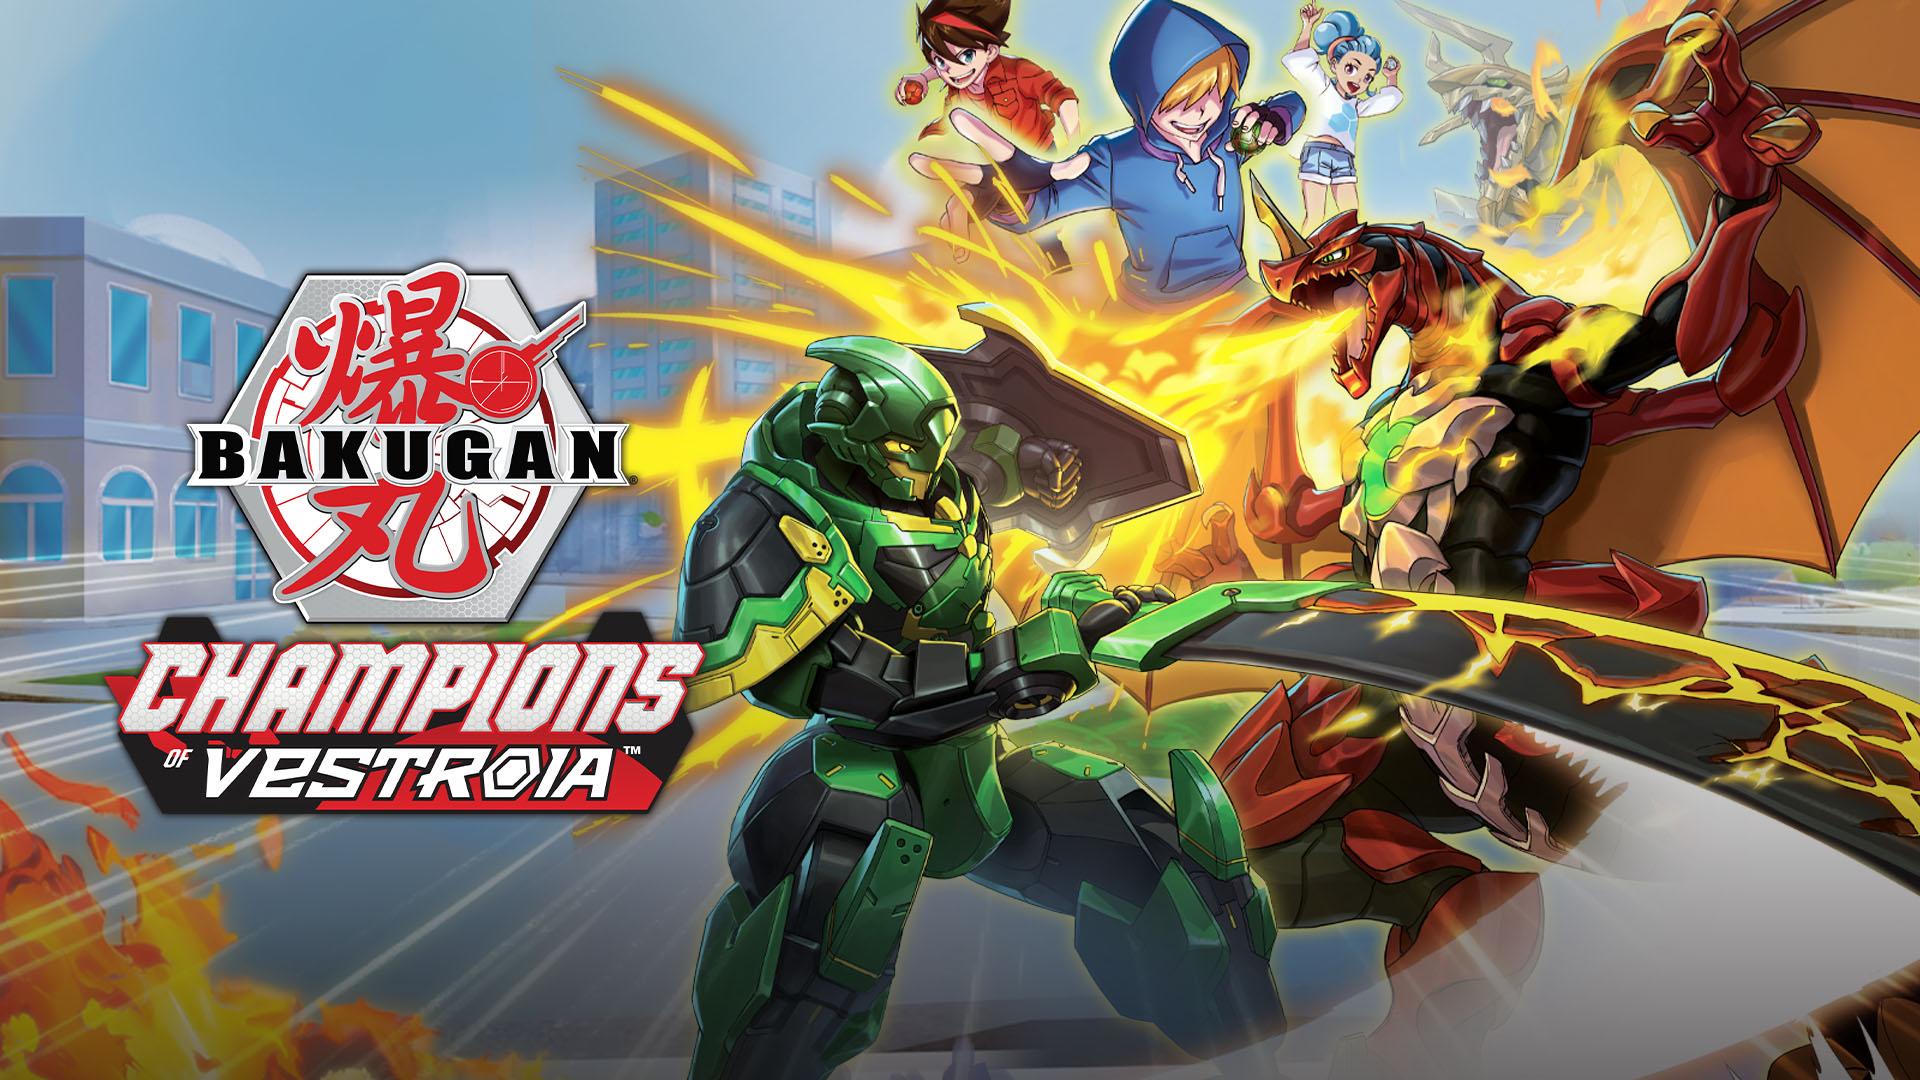 Review - Bakugan: Campeões de Vestroia - Uma Entrada Exclusiva para Nintendo Switch 1